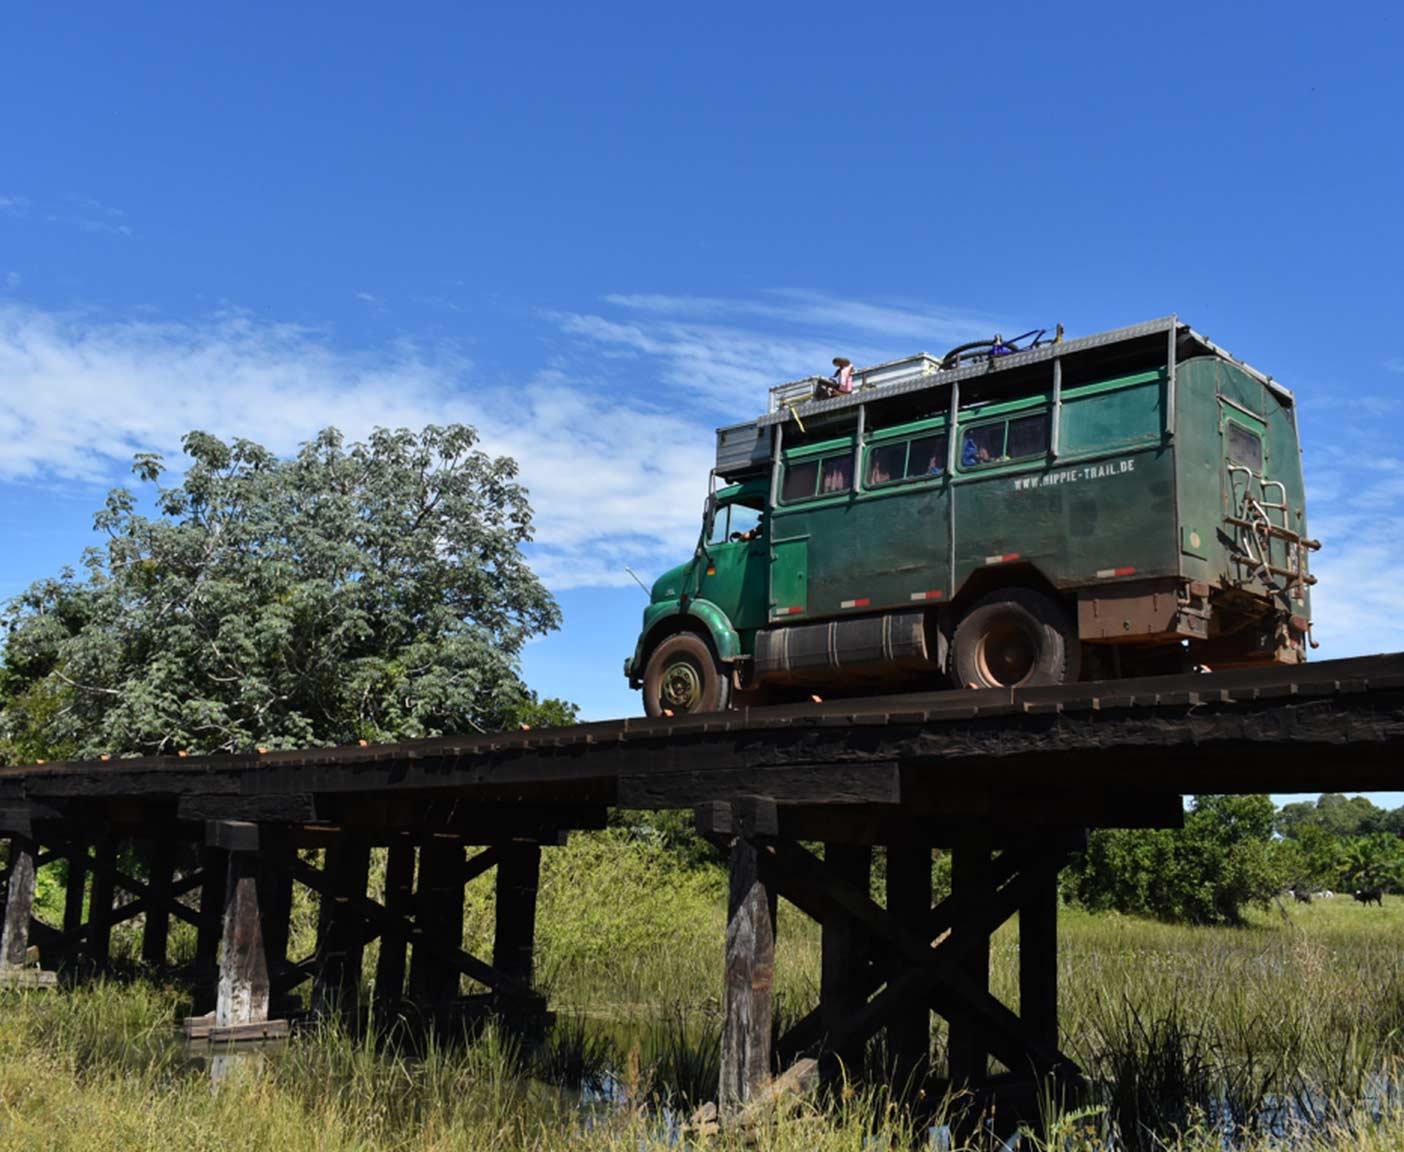 mercedes-LA-911-B-hippie-trail-kurzhauber-4x4-wohnmobil-panamericana-ma